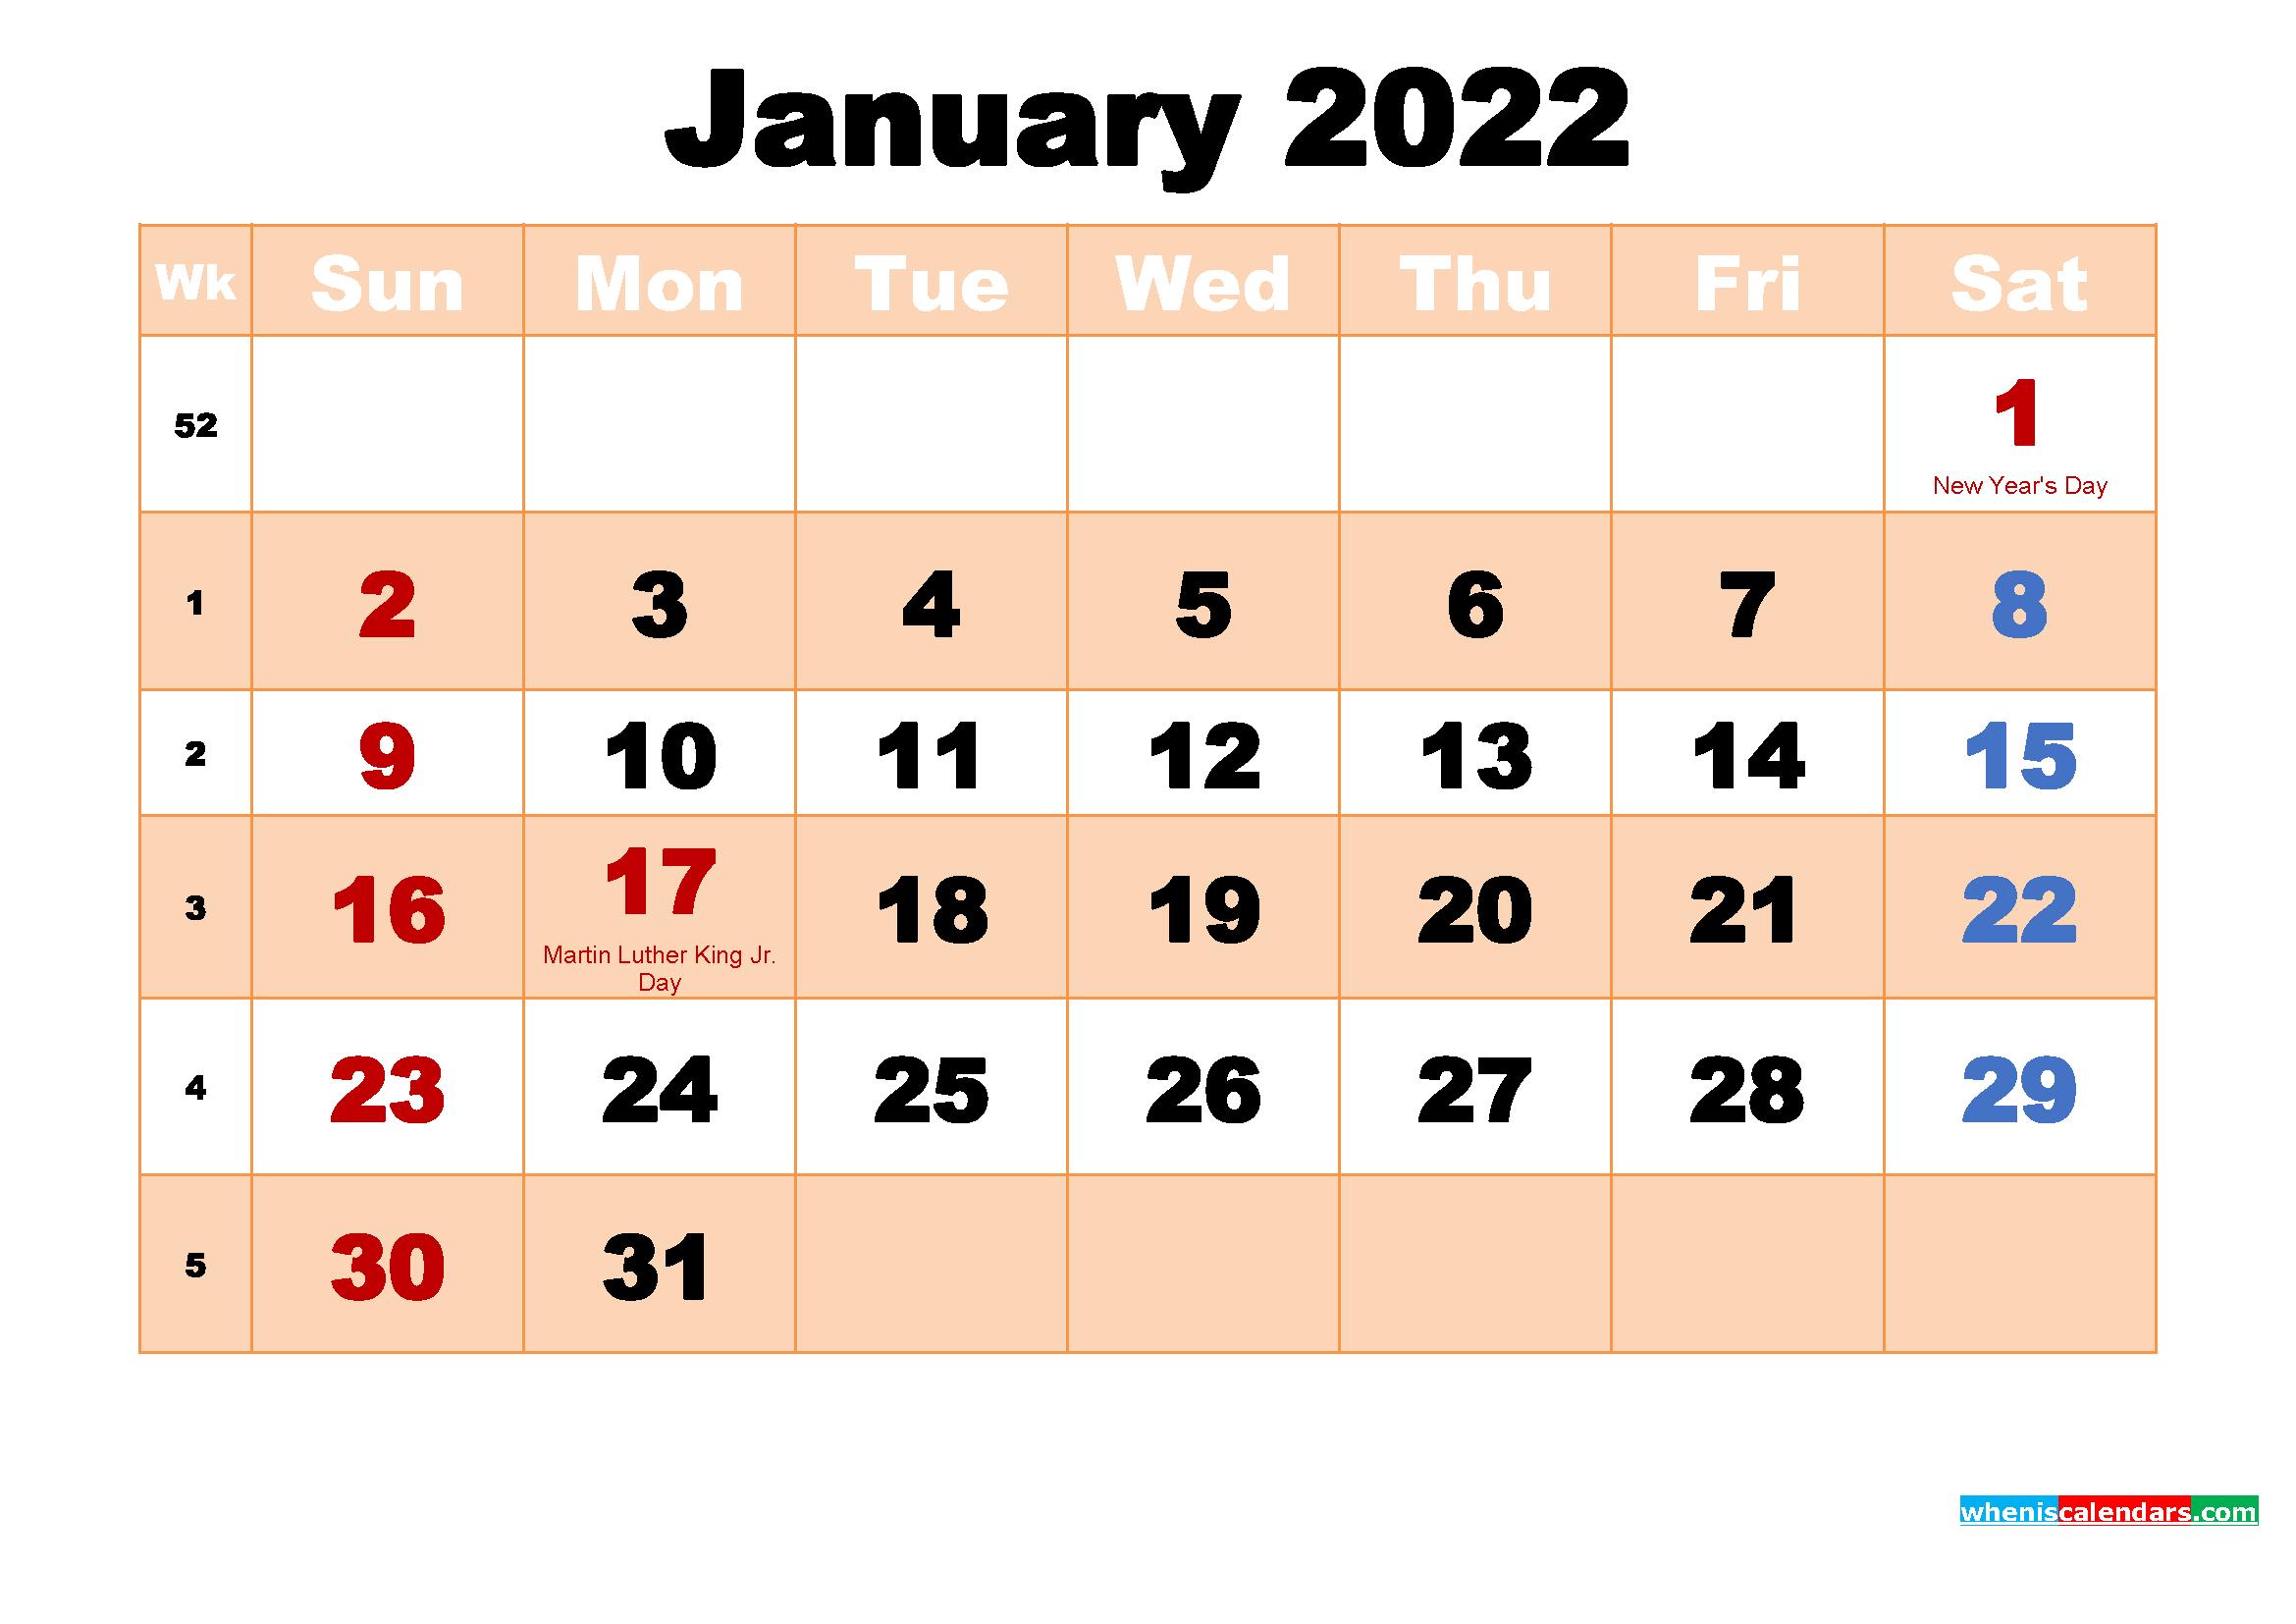 Free Printable January 2022 Calendar With Holidays Within Calendar Of January 2022